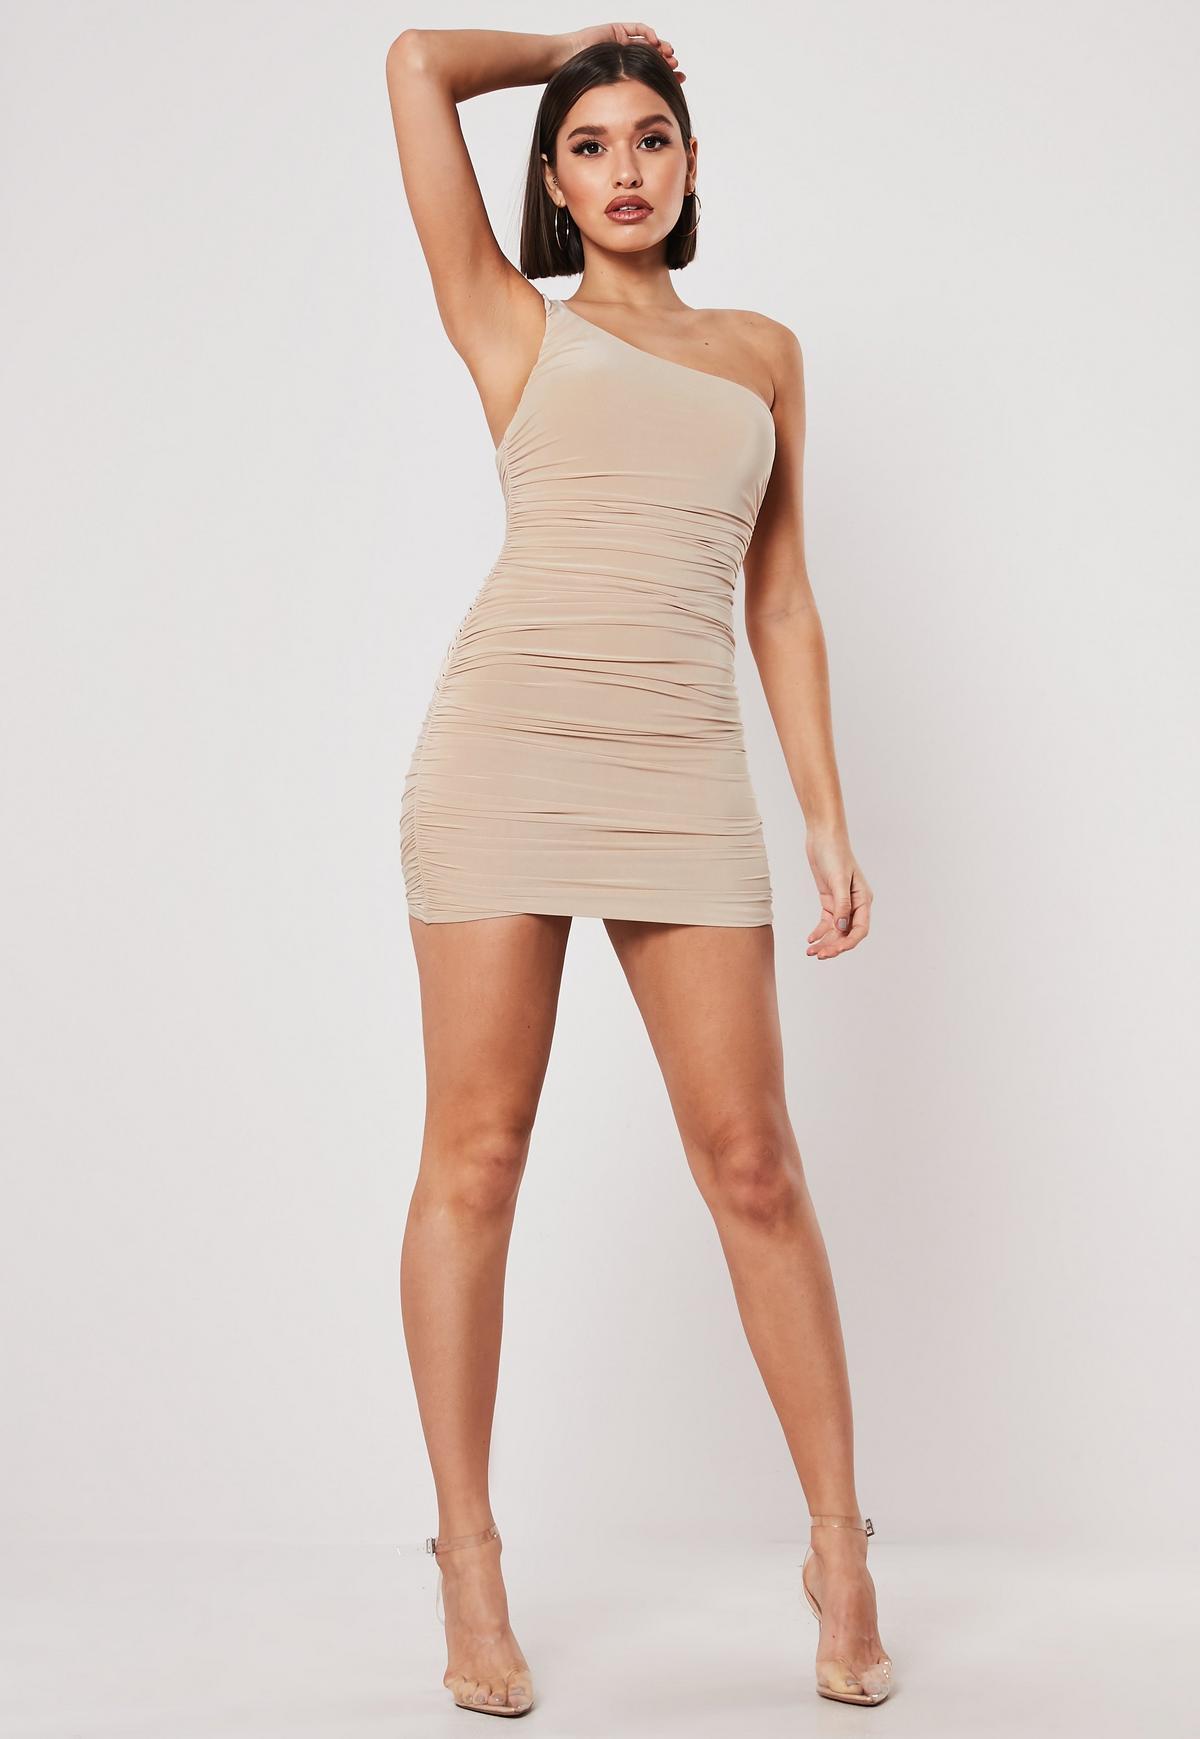 Blush Slinky One Shoulder Ruched Bodycon Mini Dress #